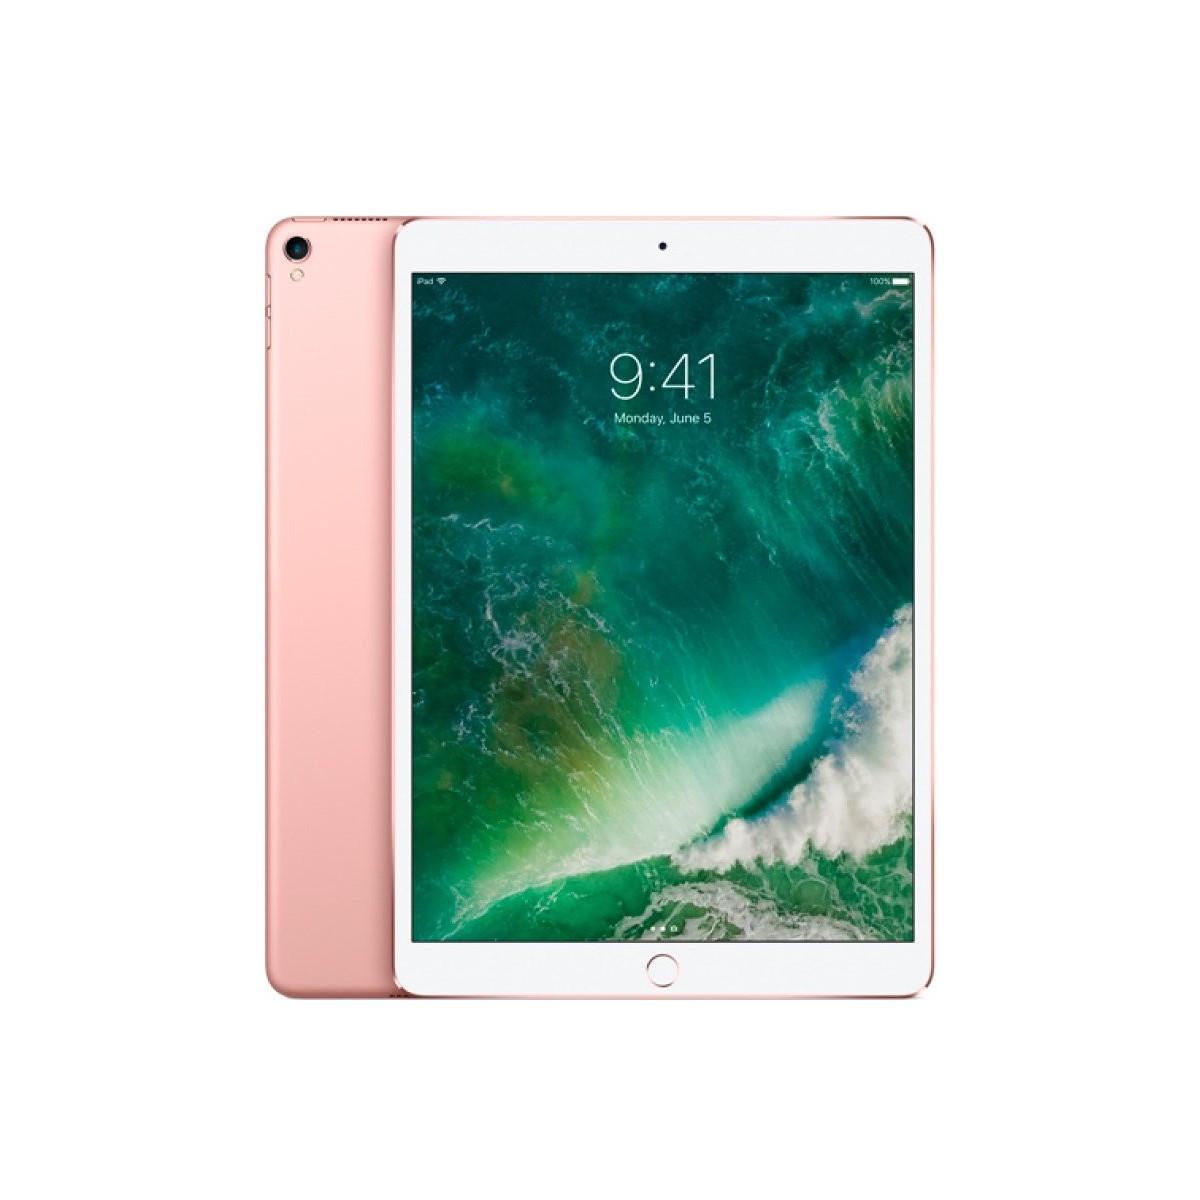 Apple iPad Pro 10.5 64Gb Wi-Fi+4G Rose Gold (MQF22RK) 2017